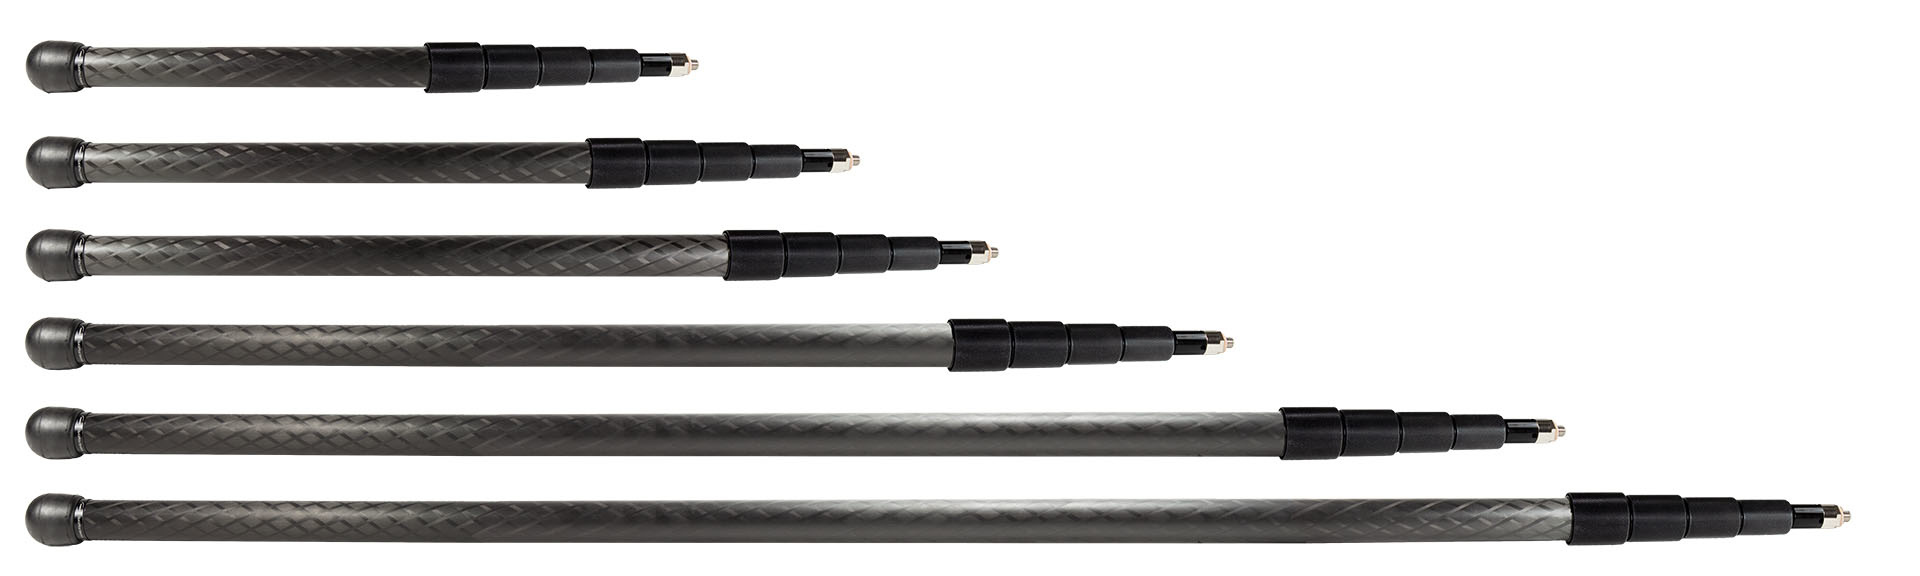 Ambient Ambient - QP565 Series 5 - 66 - 243 cm